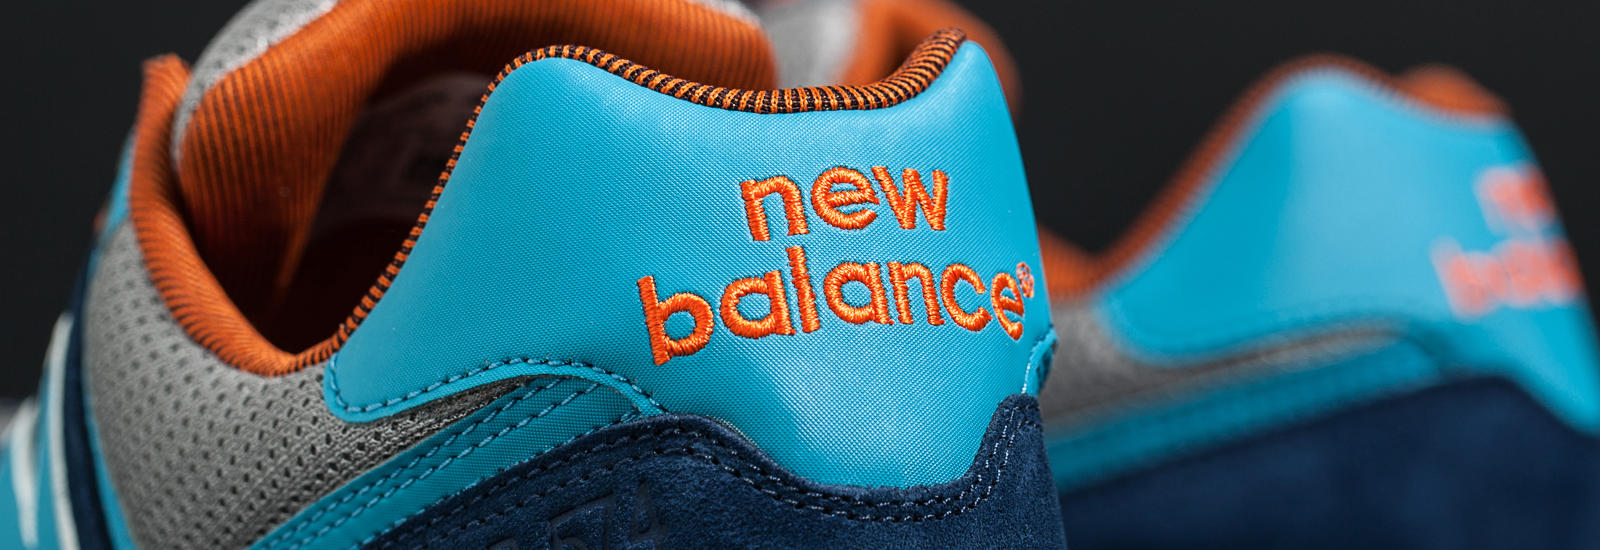 ... harga sepatu new balance 574 asli . a4a850c414